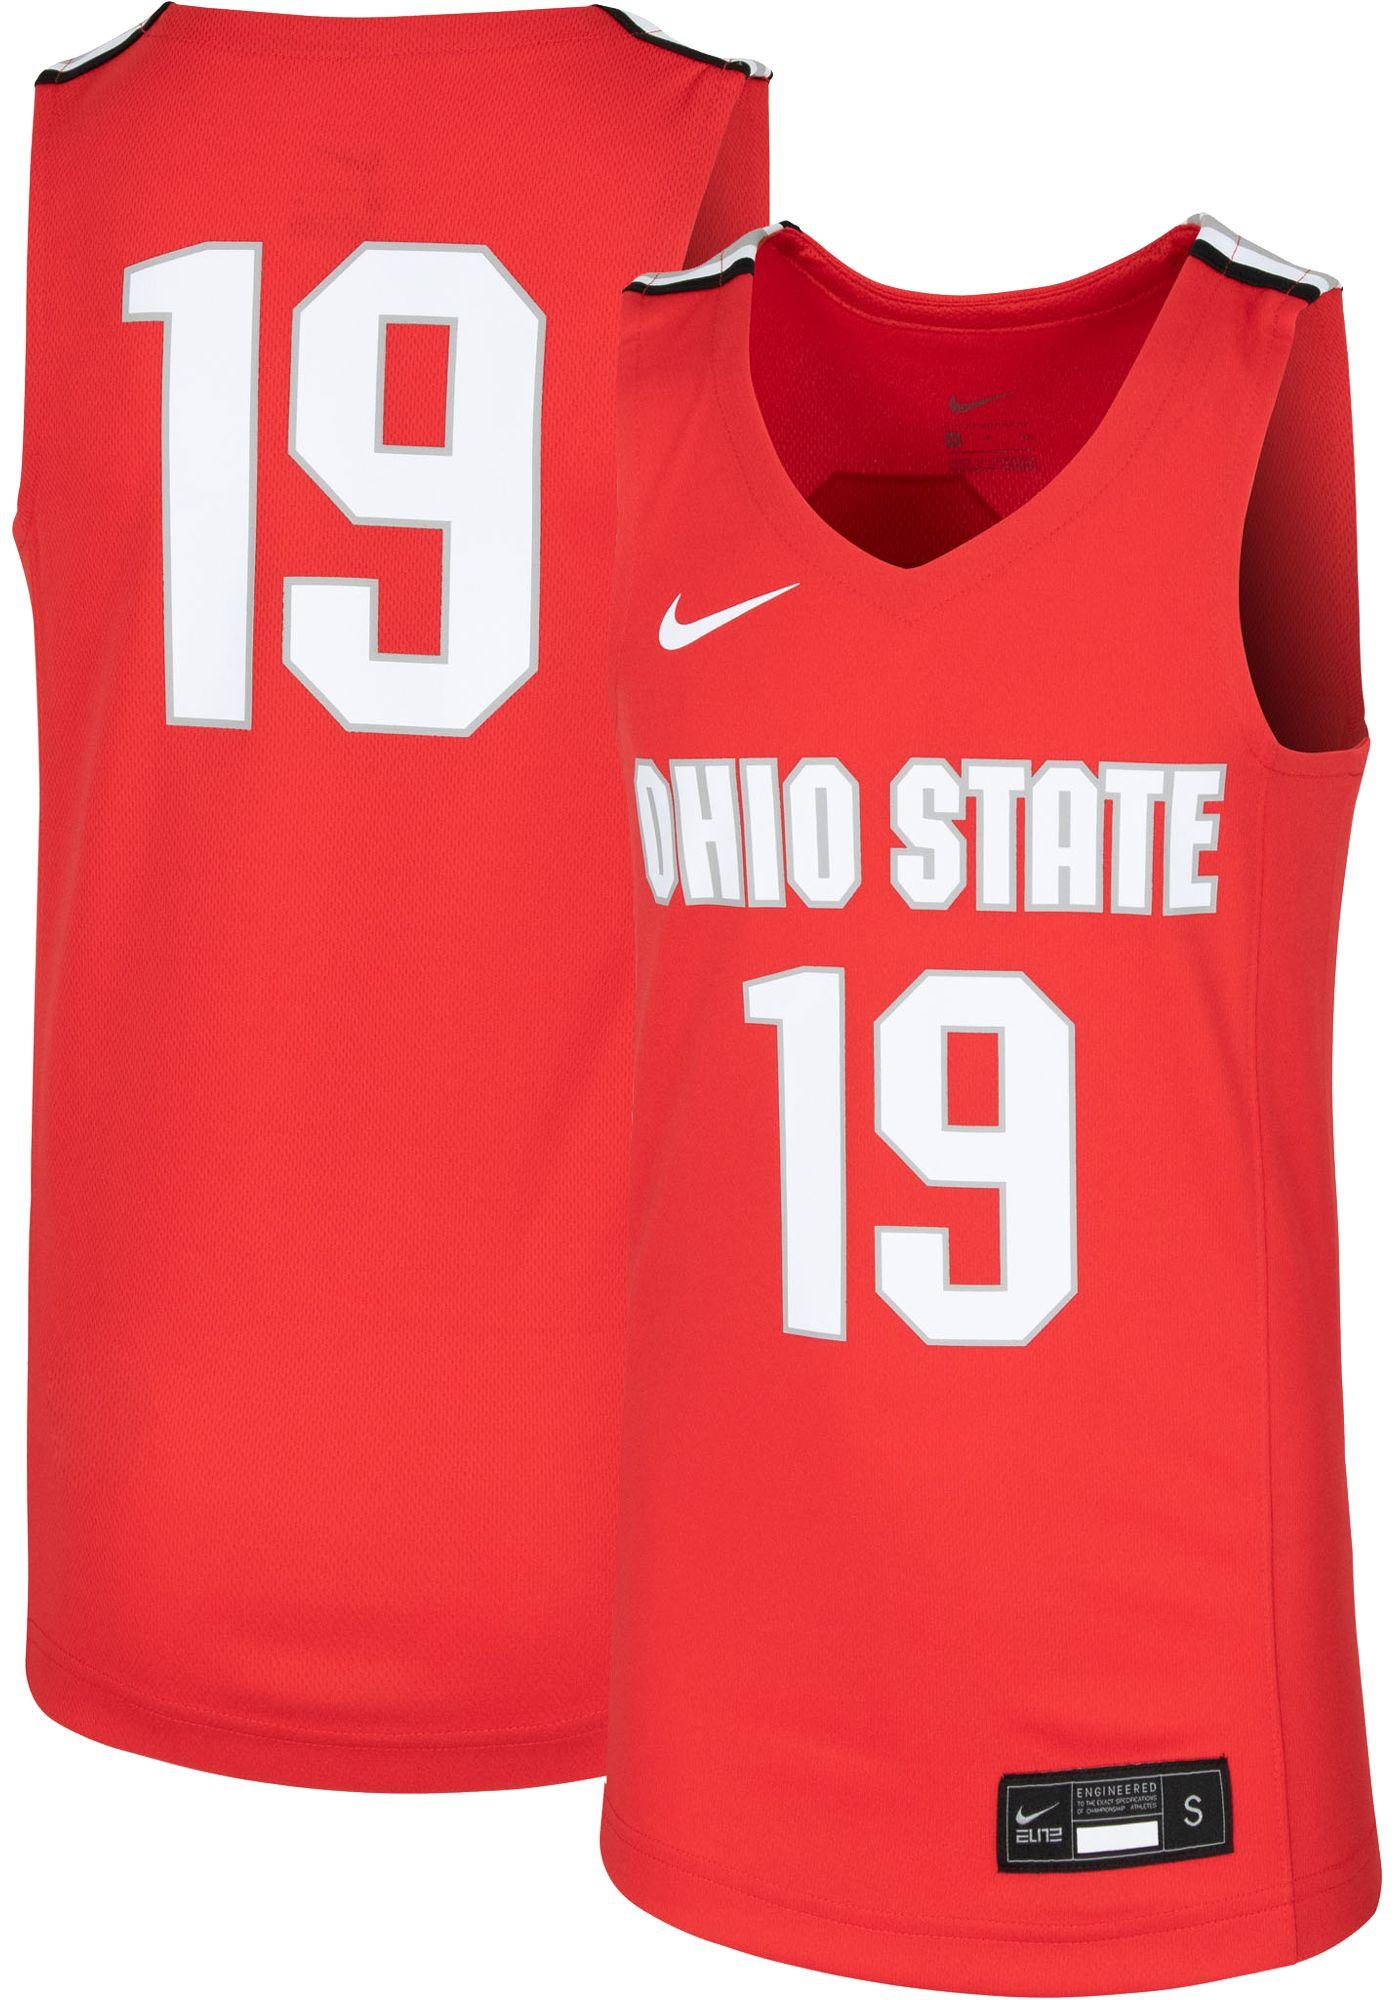 Nike Youth Ohio State Buckeyes #19 Scarlet Replica Basketball Jersey